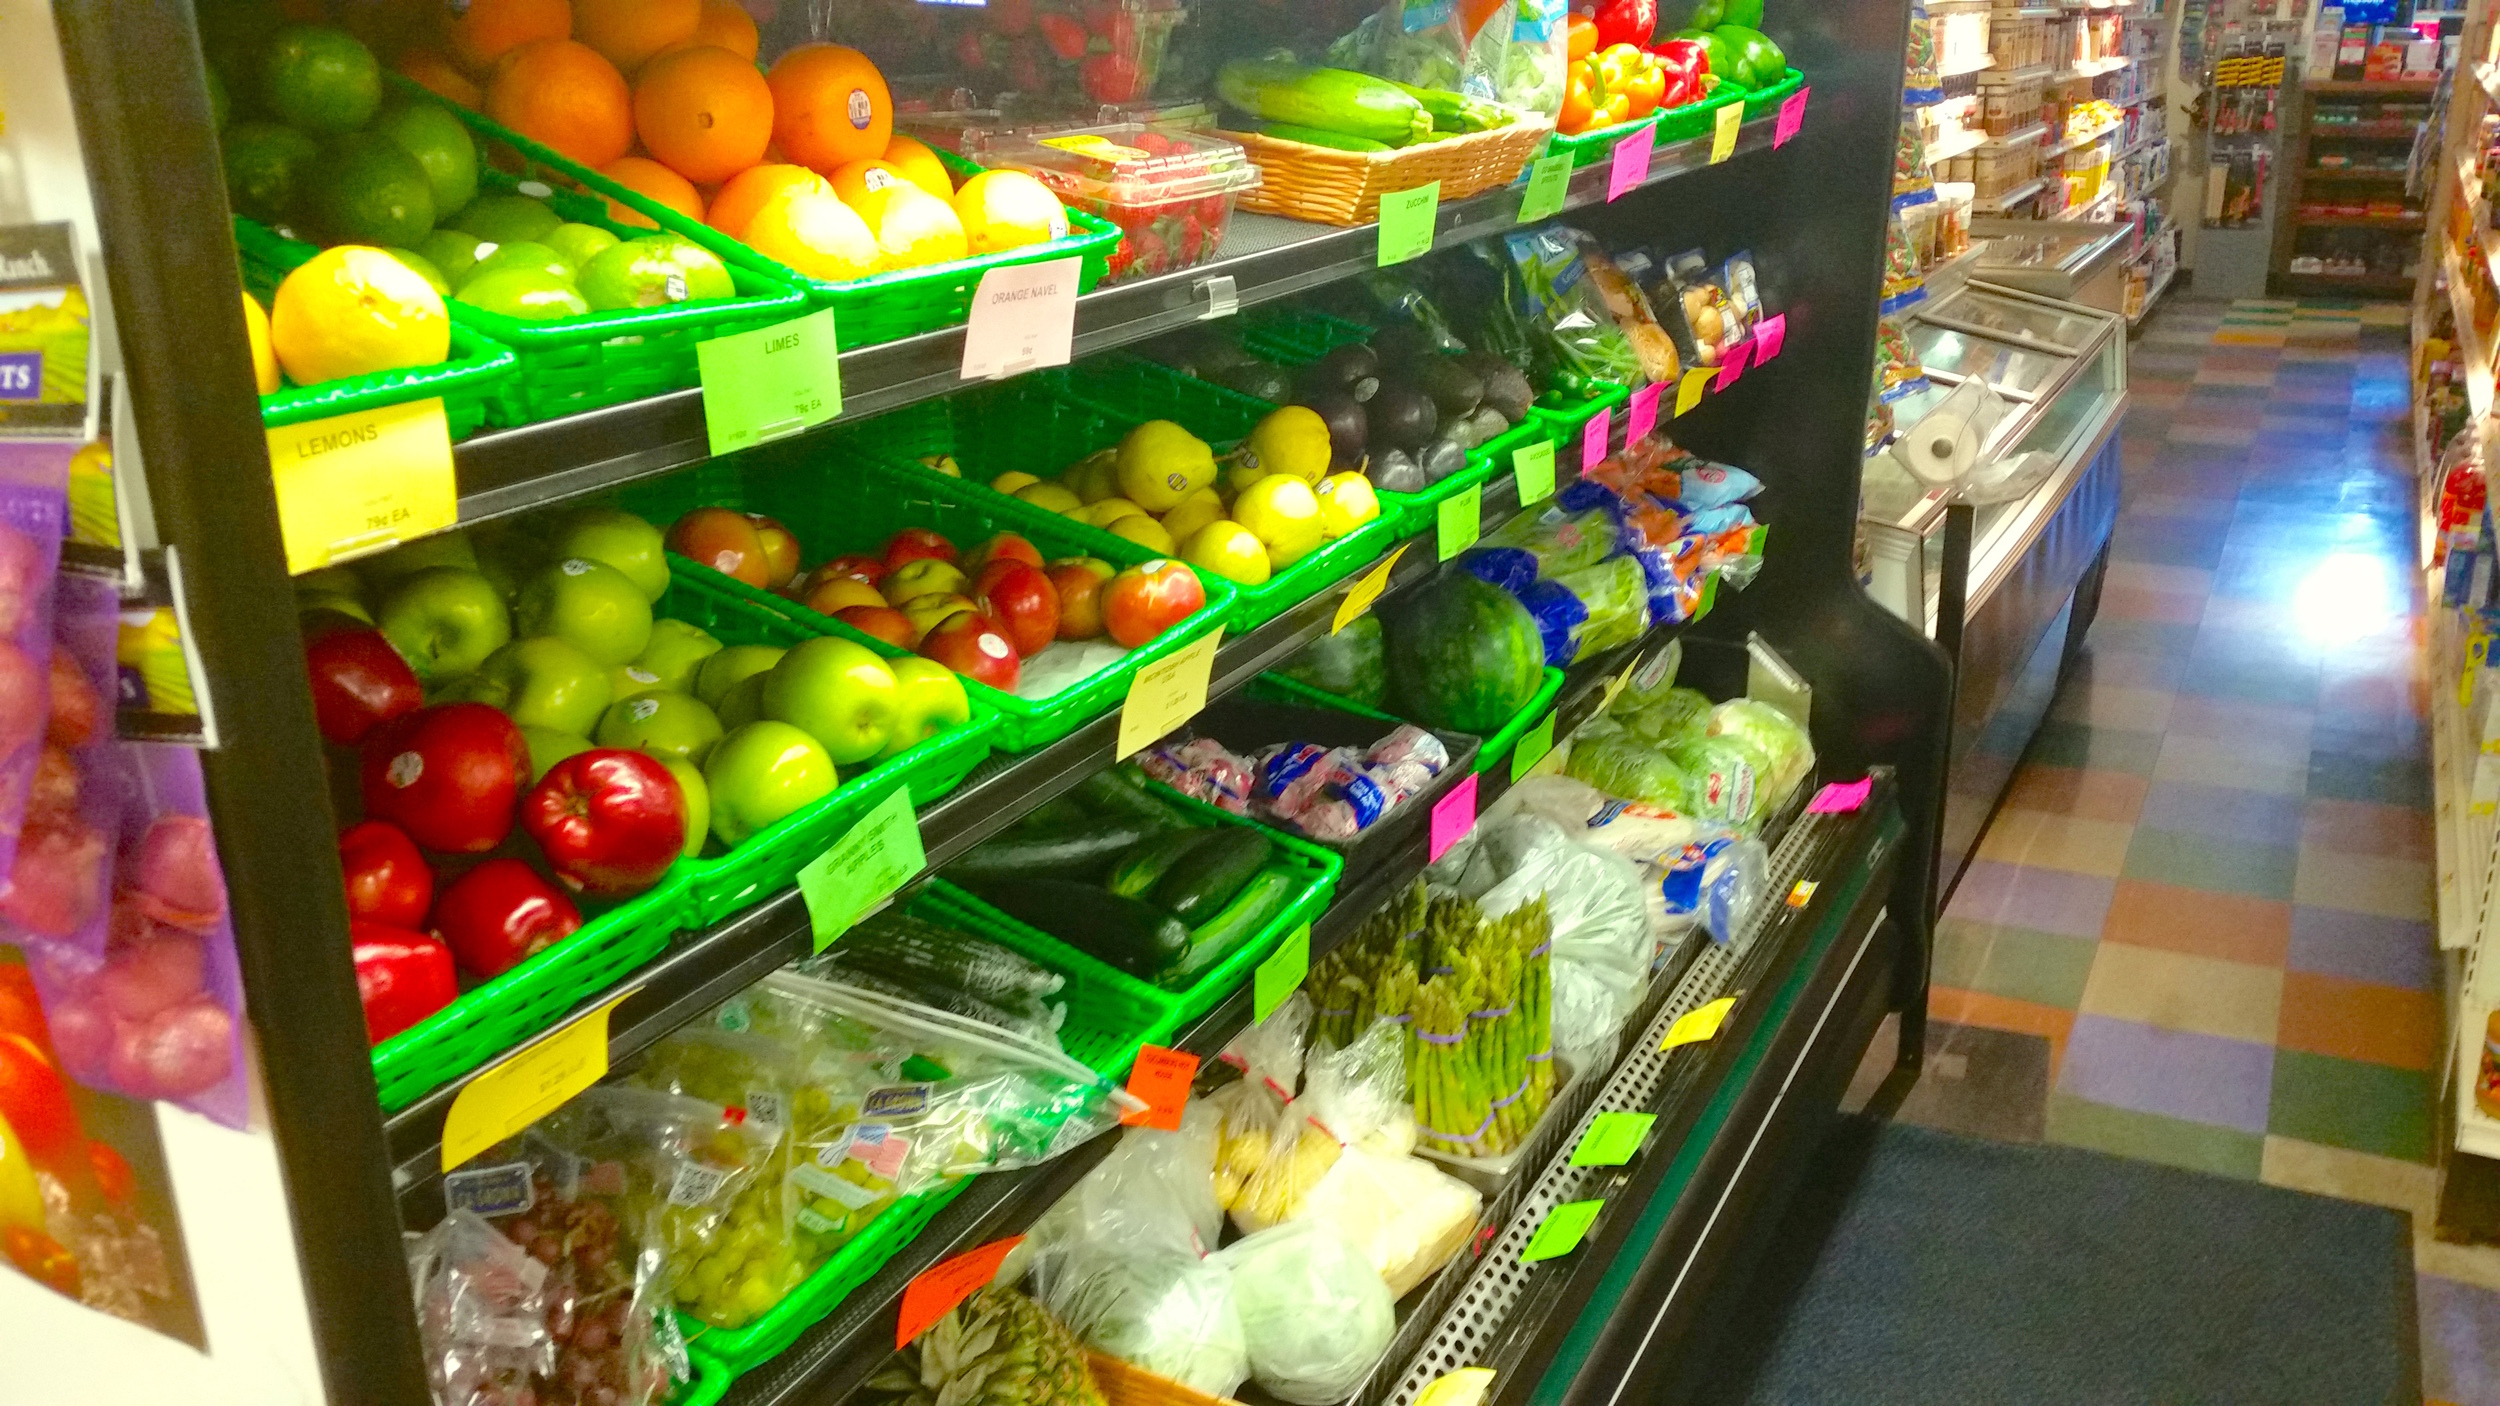 wardsboro_country_store_produce_2.jpg